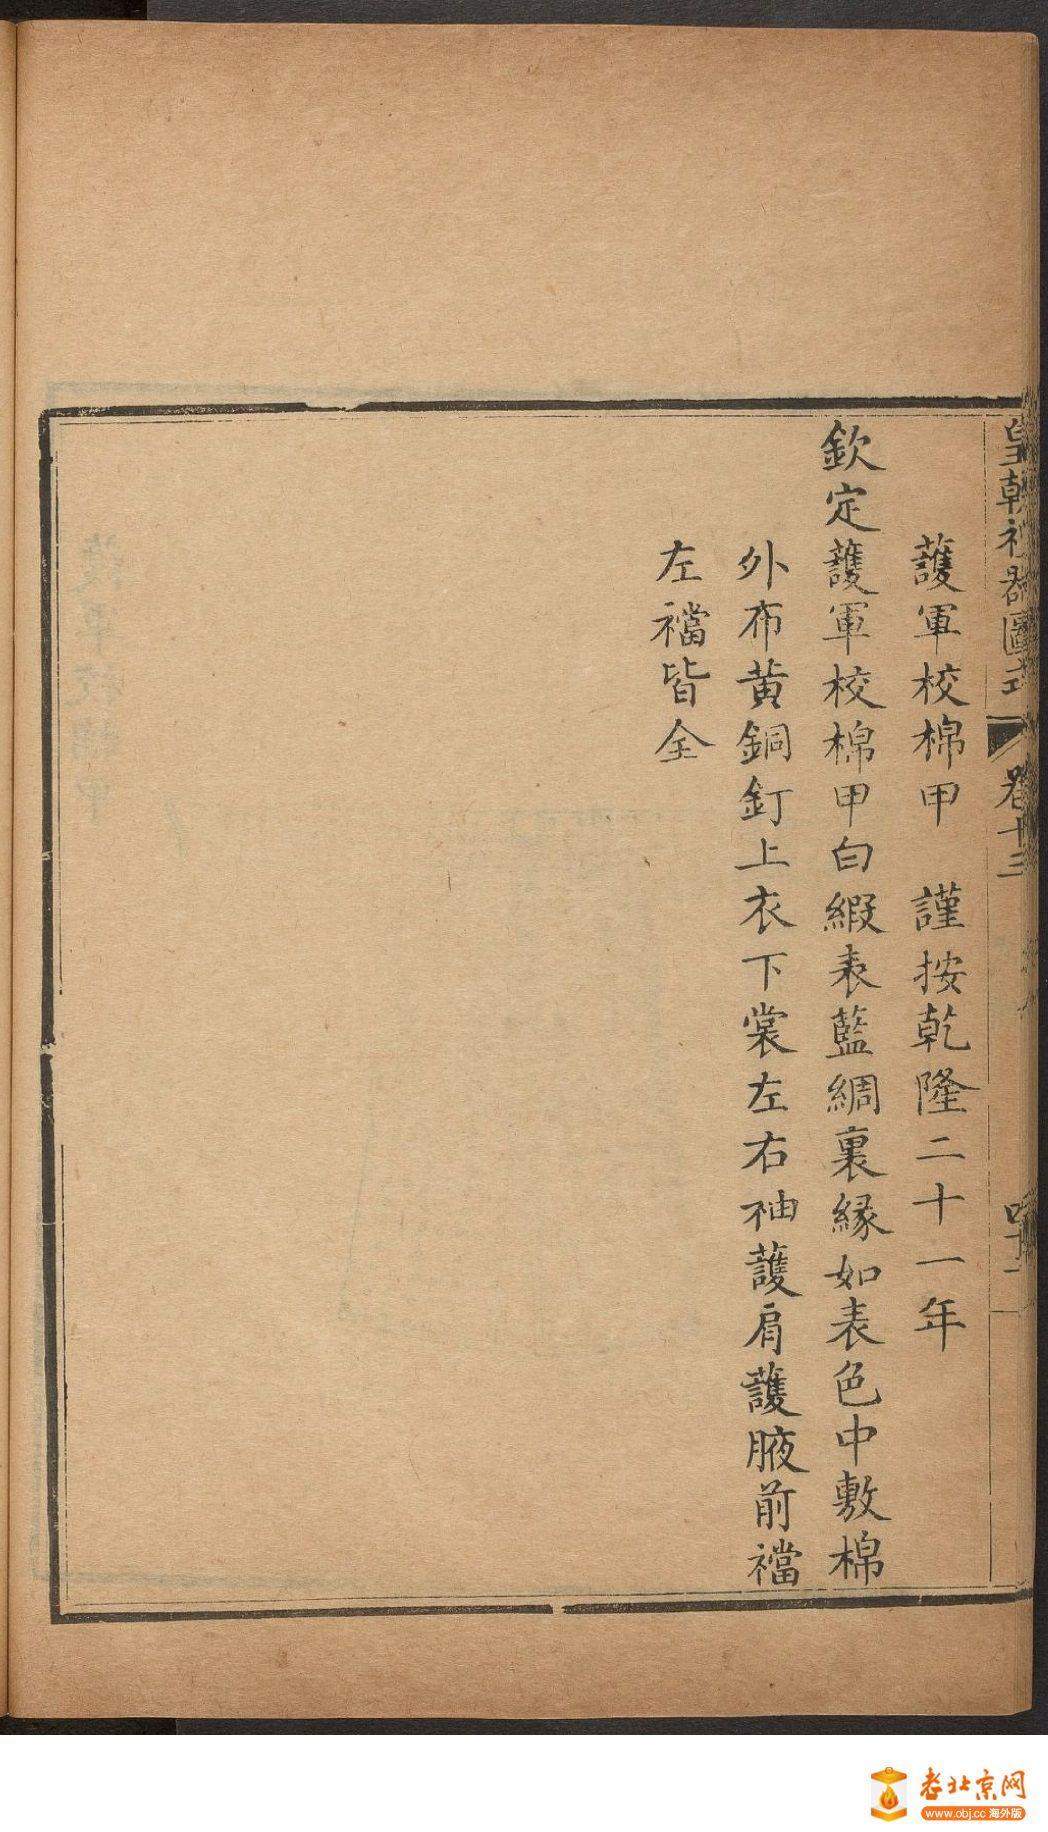 5_page3_image1b.jpg